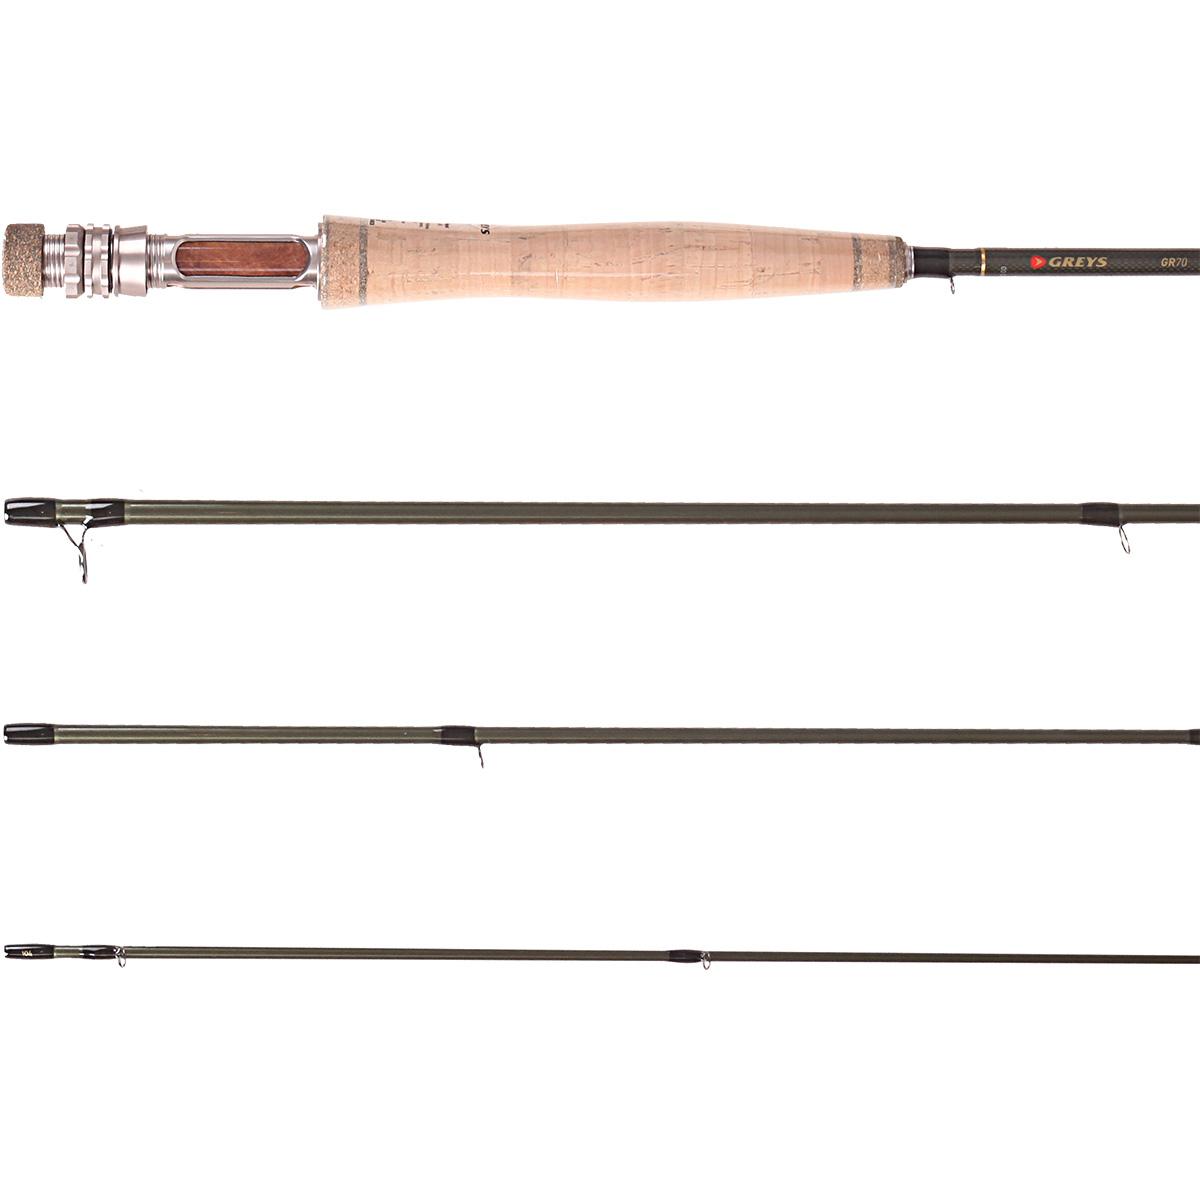 Greys gr 70 streamflex fly fishing rods ebay for Fly fishing rods